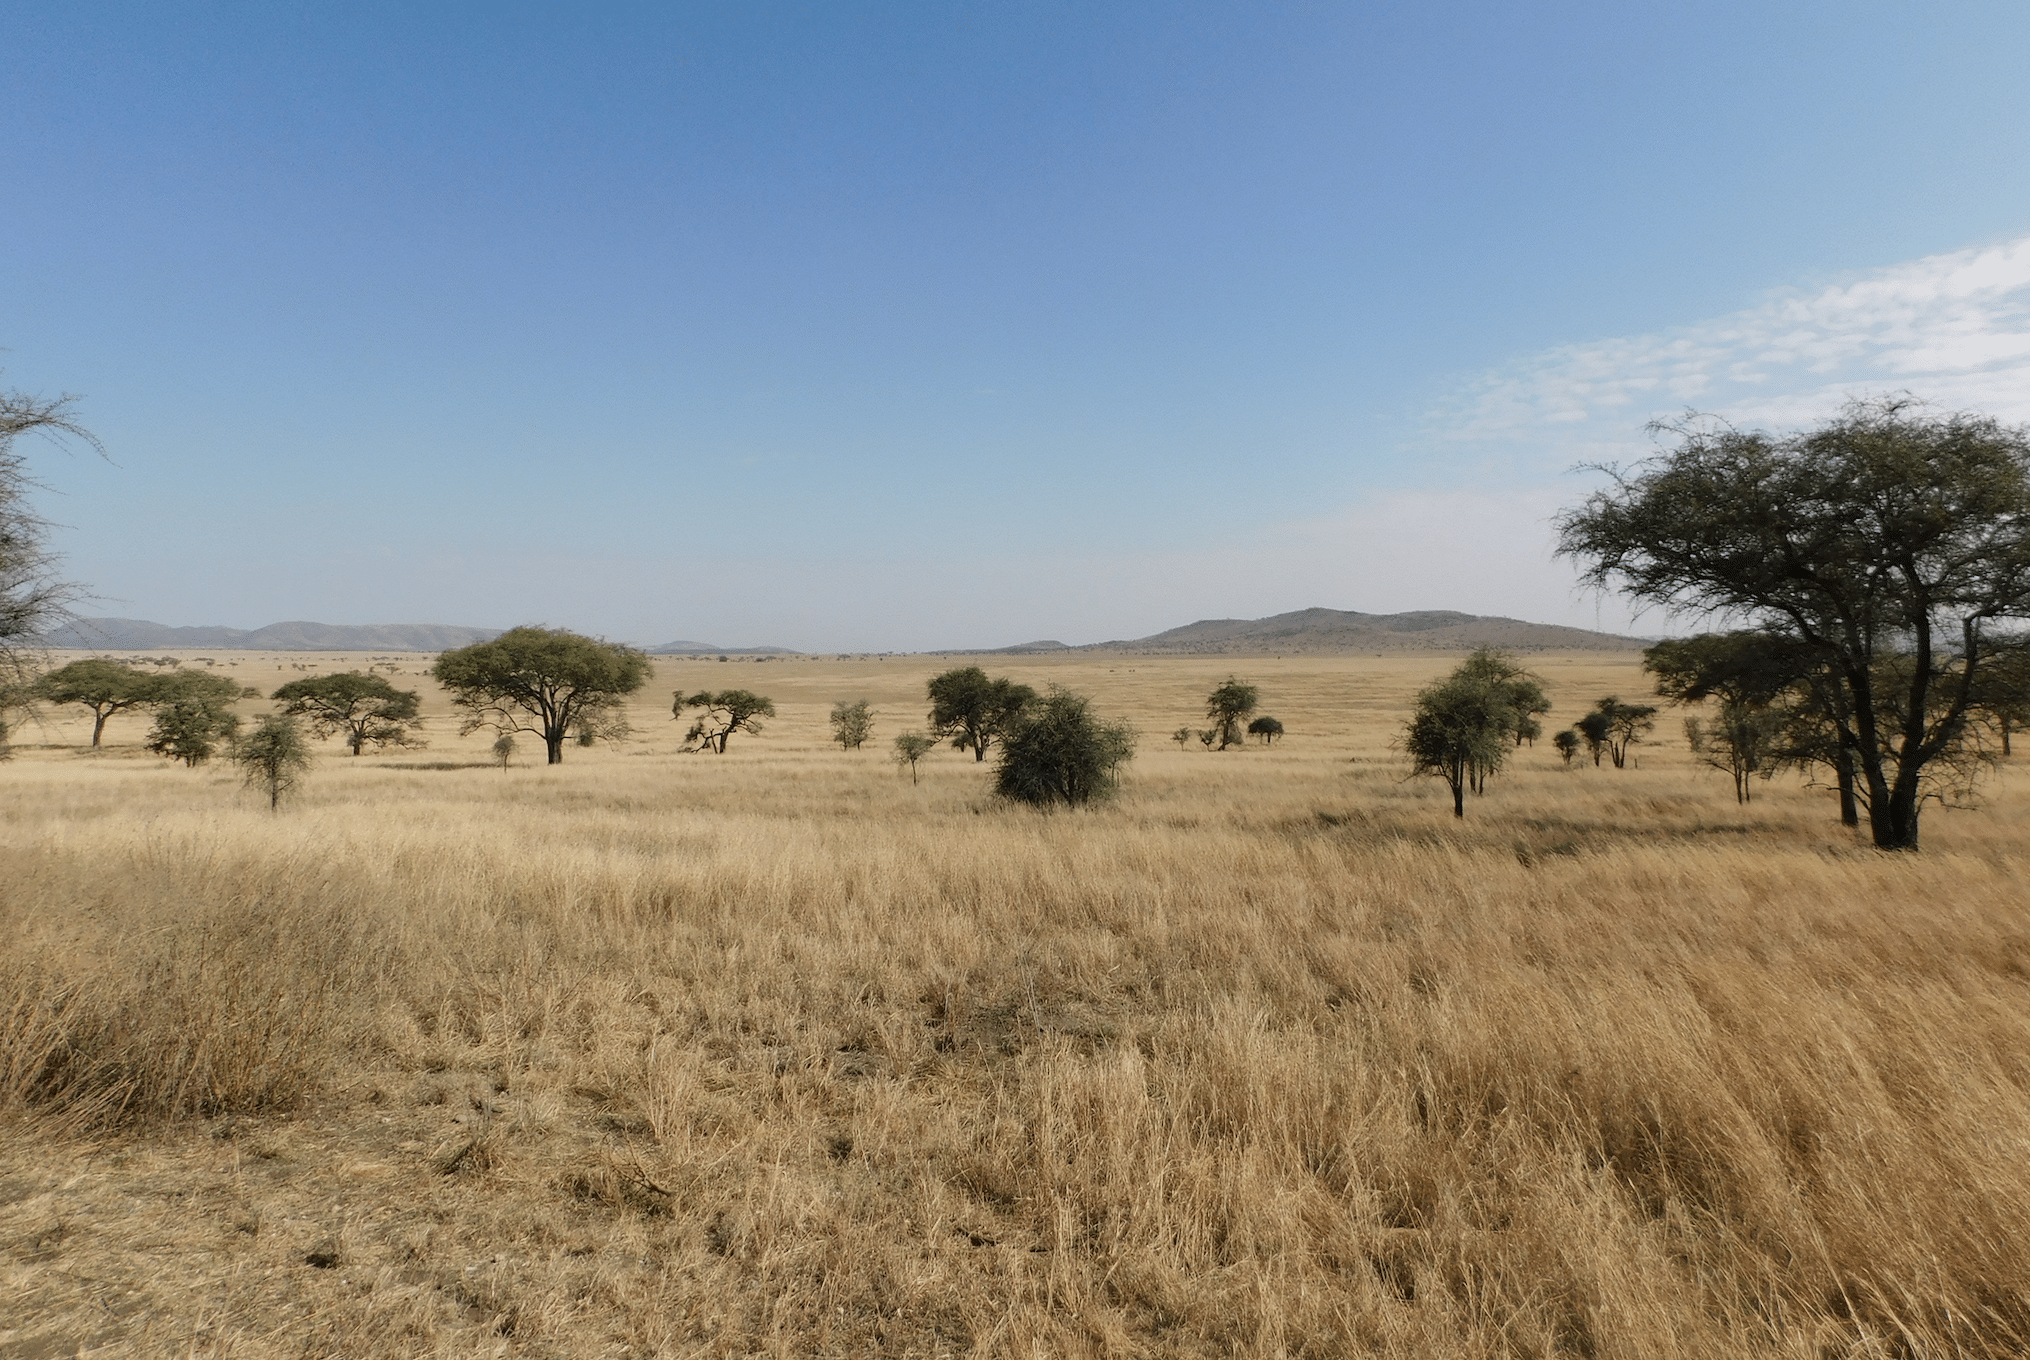 safari en tanzanie : paysages du parc du serengeti